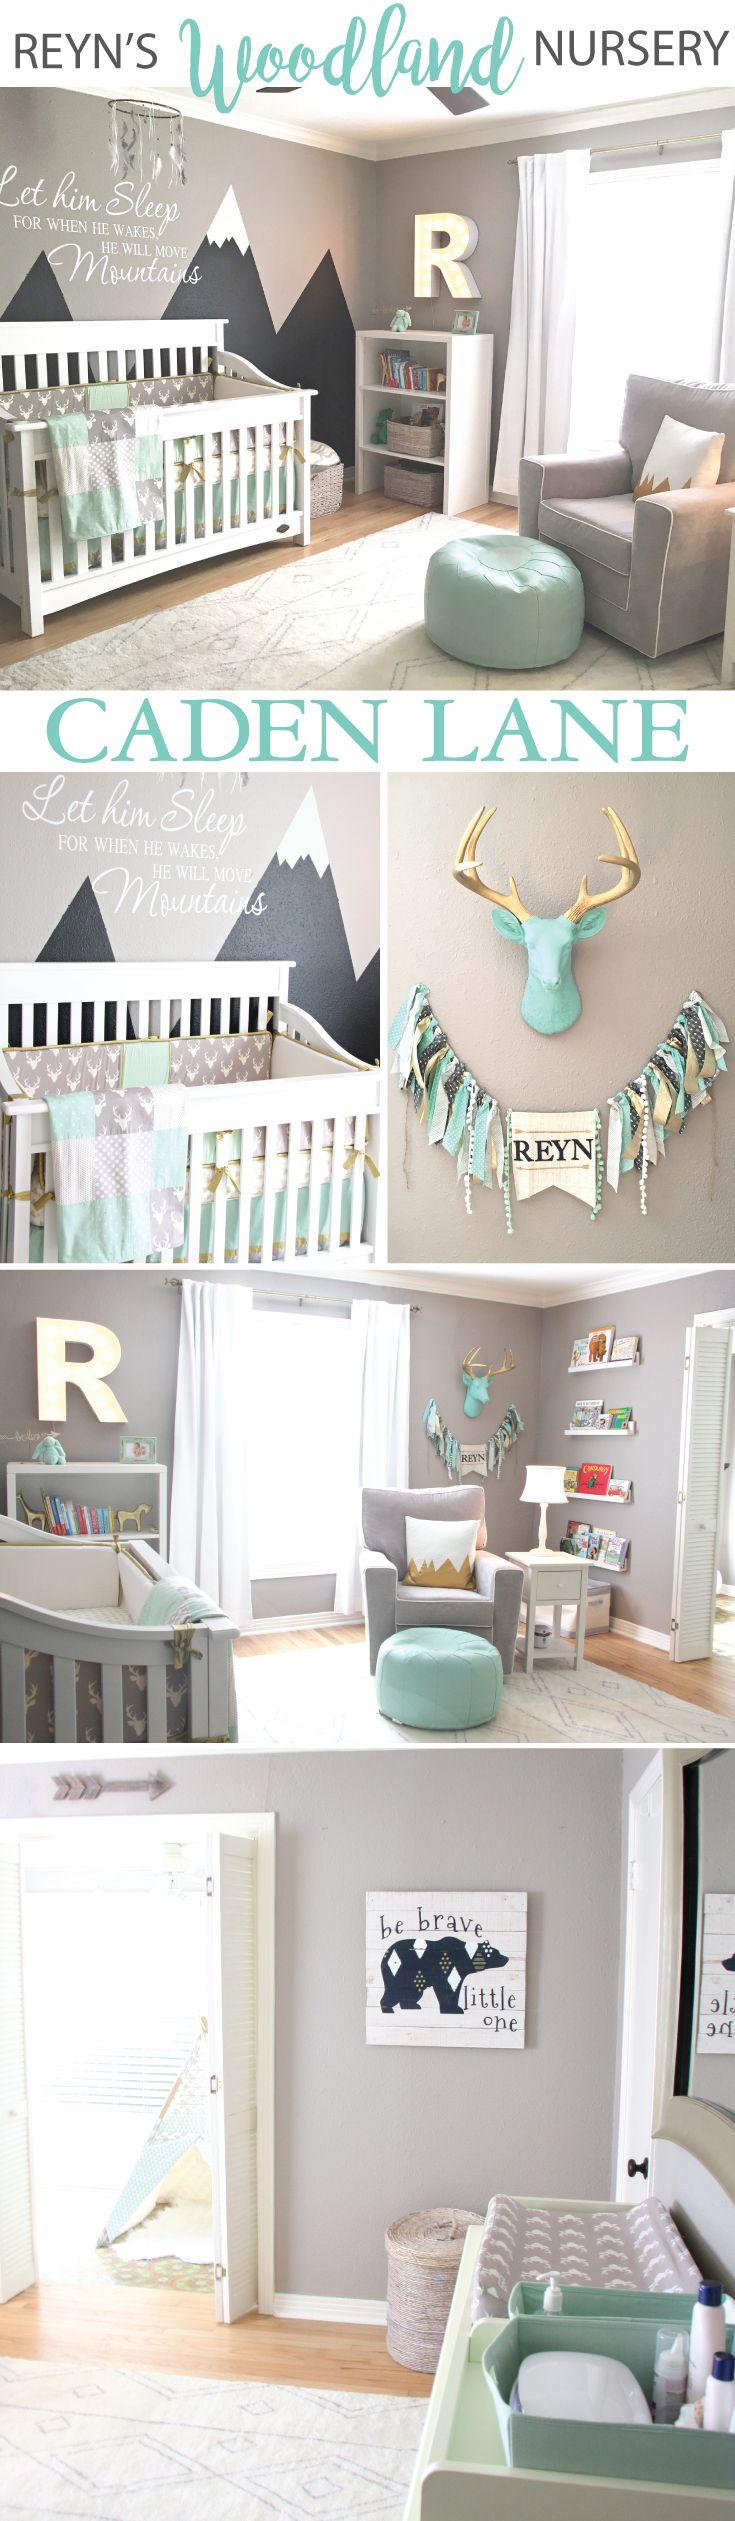 Best 25+ Baby boy rooms ideas on Pinterest | Baby room ...